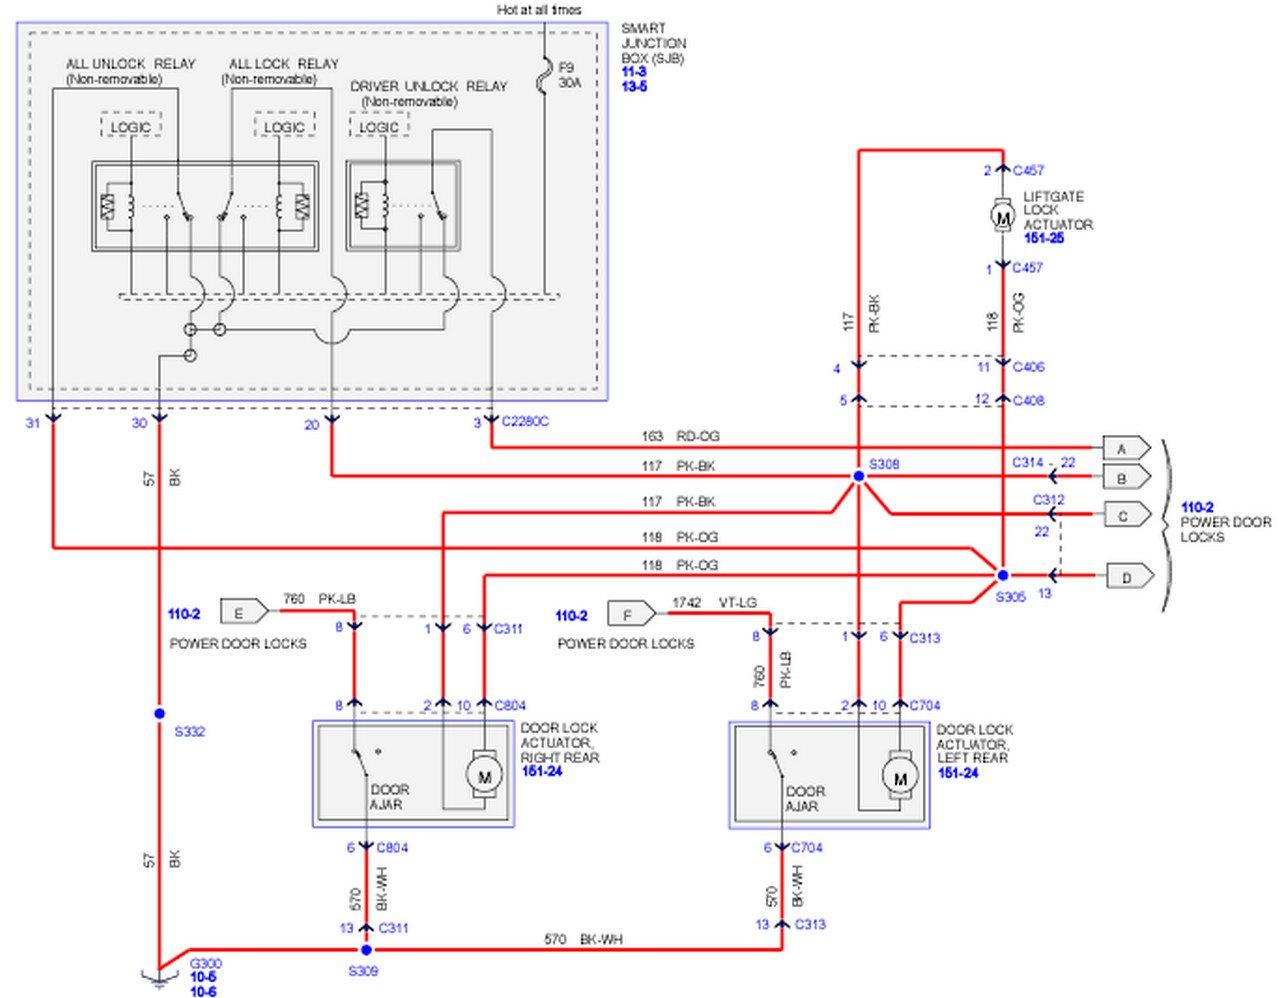 LY_1465] 2006 Ford Escape Wiring Diagram Free DiagramSequ Diog Ginou Pelap Elec Mohammedshrine Librar Wiring 101